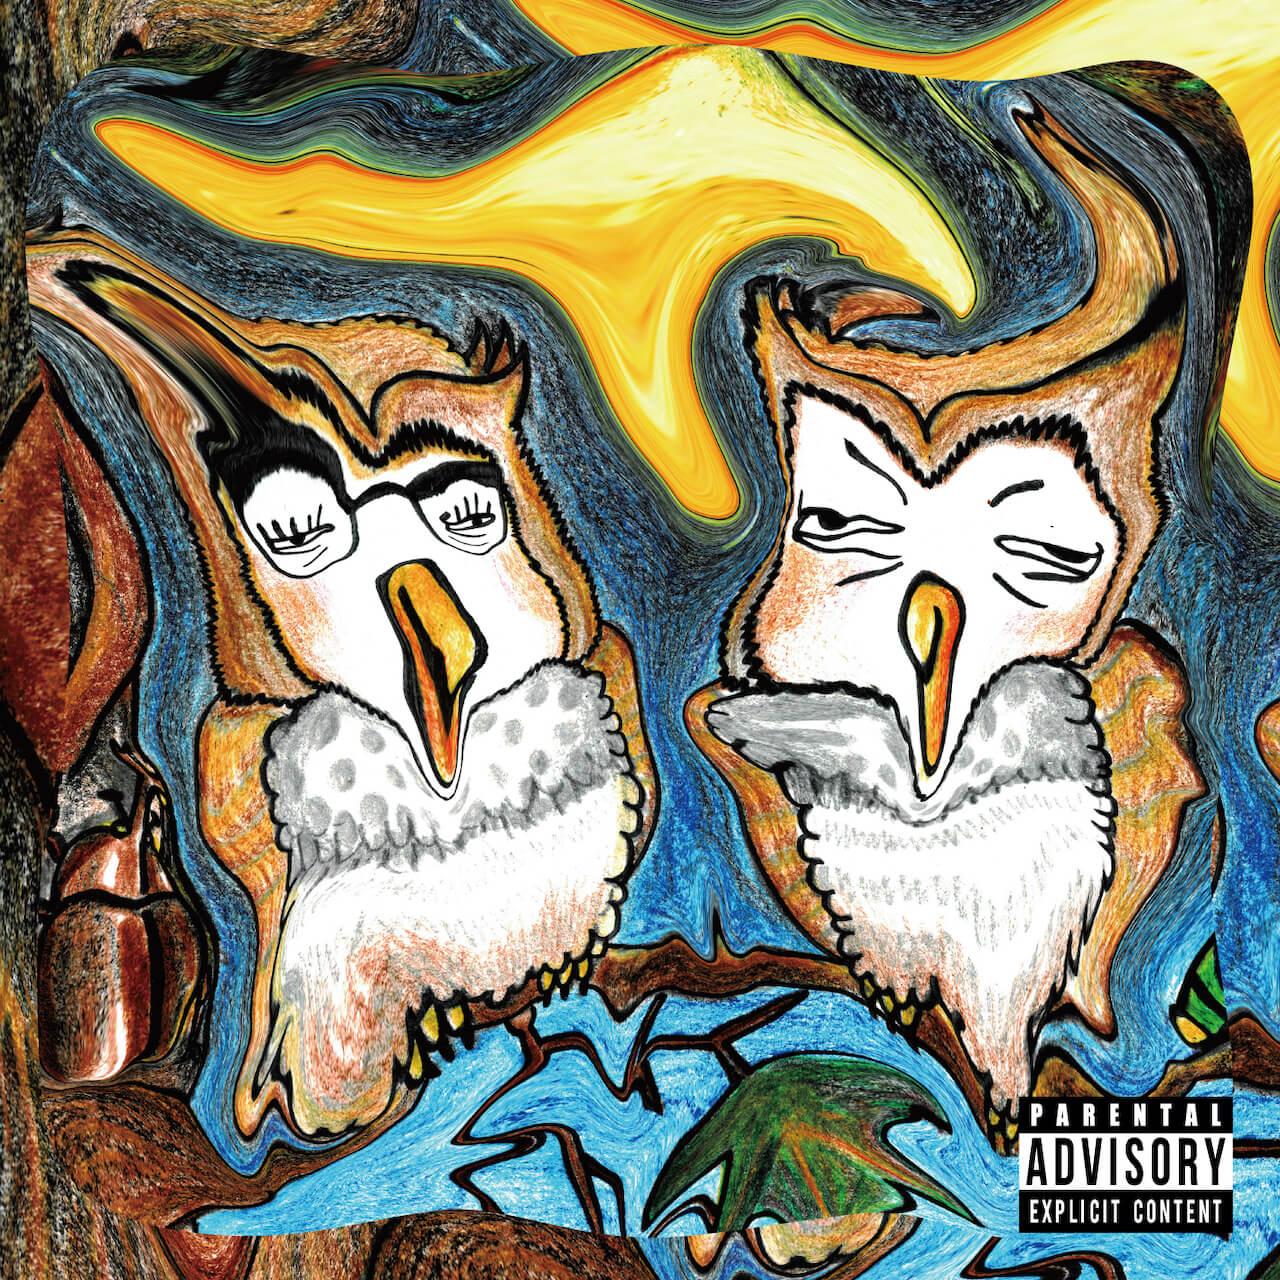 owls「blessin remix」にA-THUG&EMI MARIAが参加|Spikey John制作のMVも同時公開 music201021-owls-3